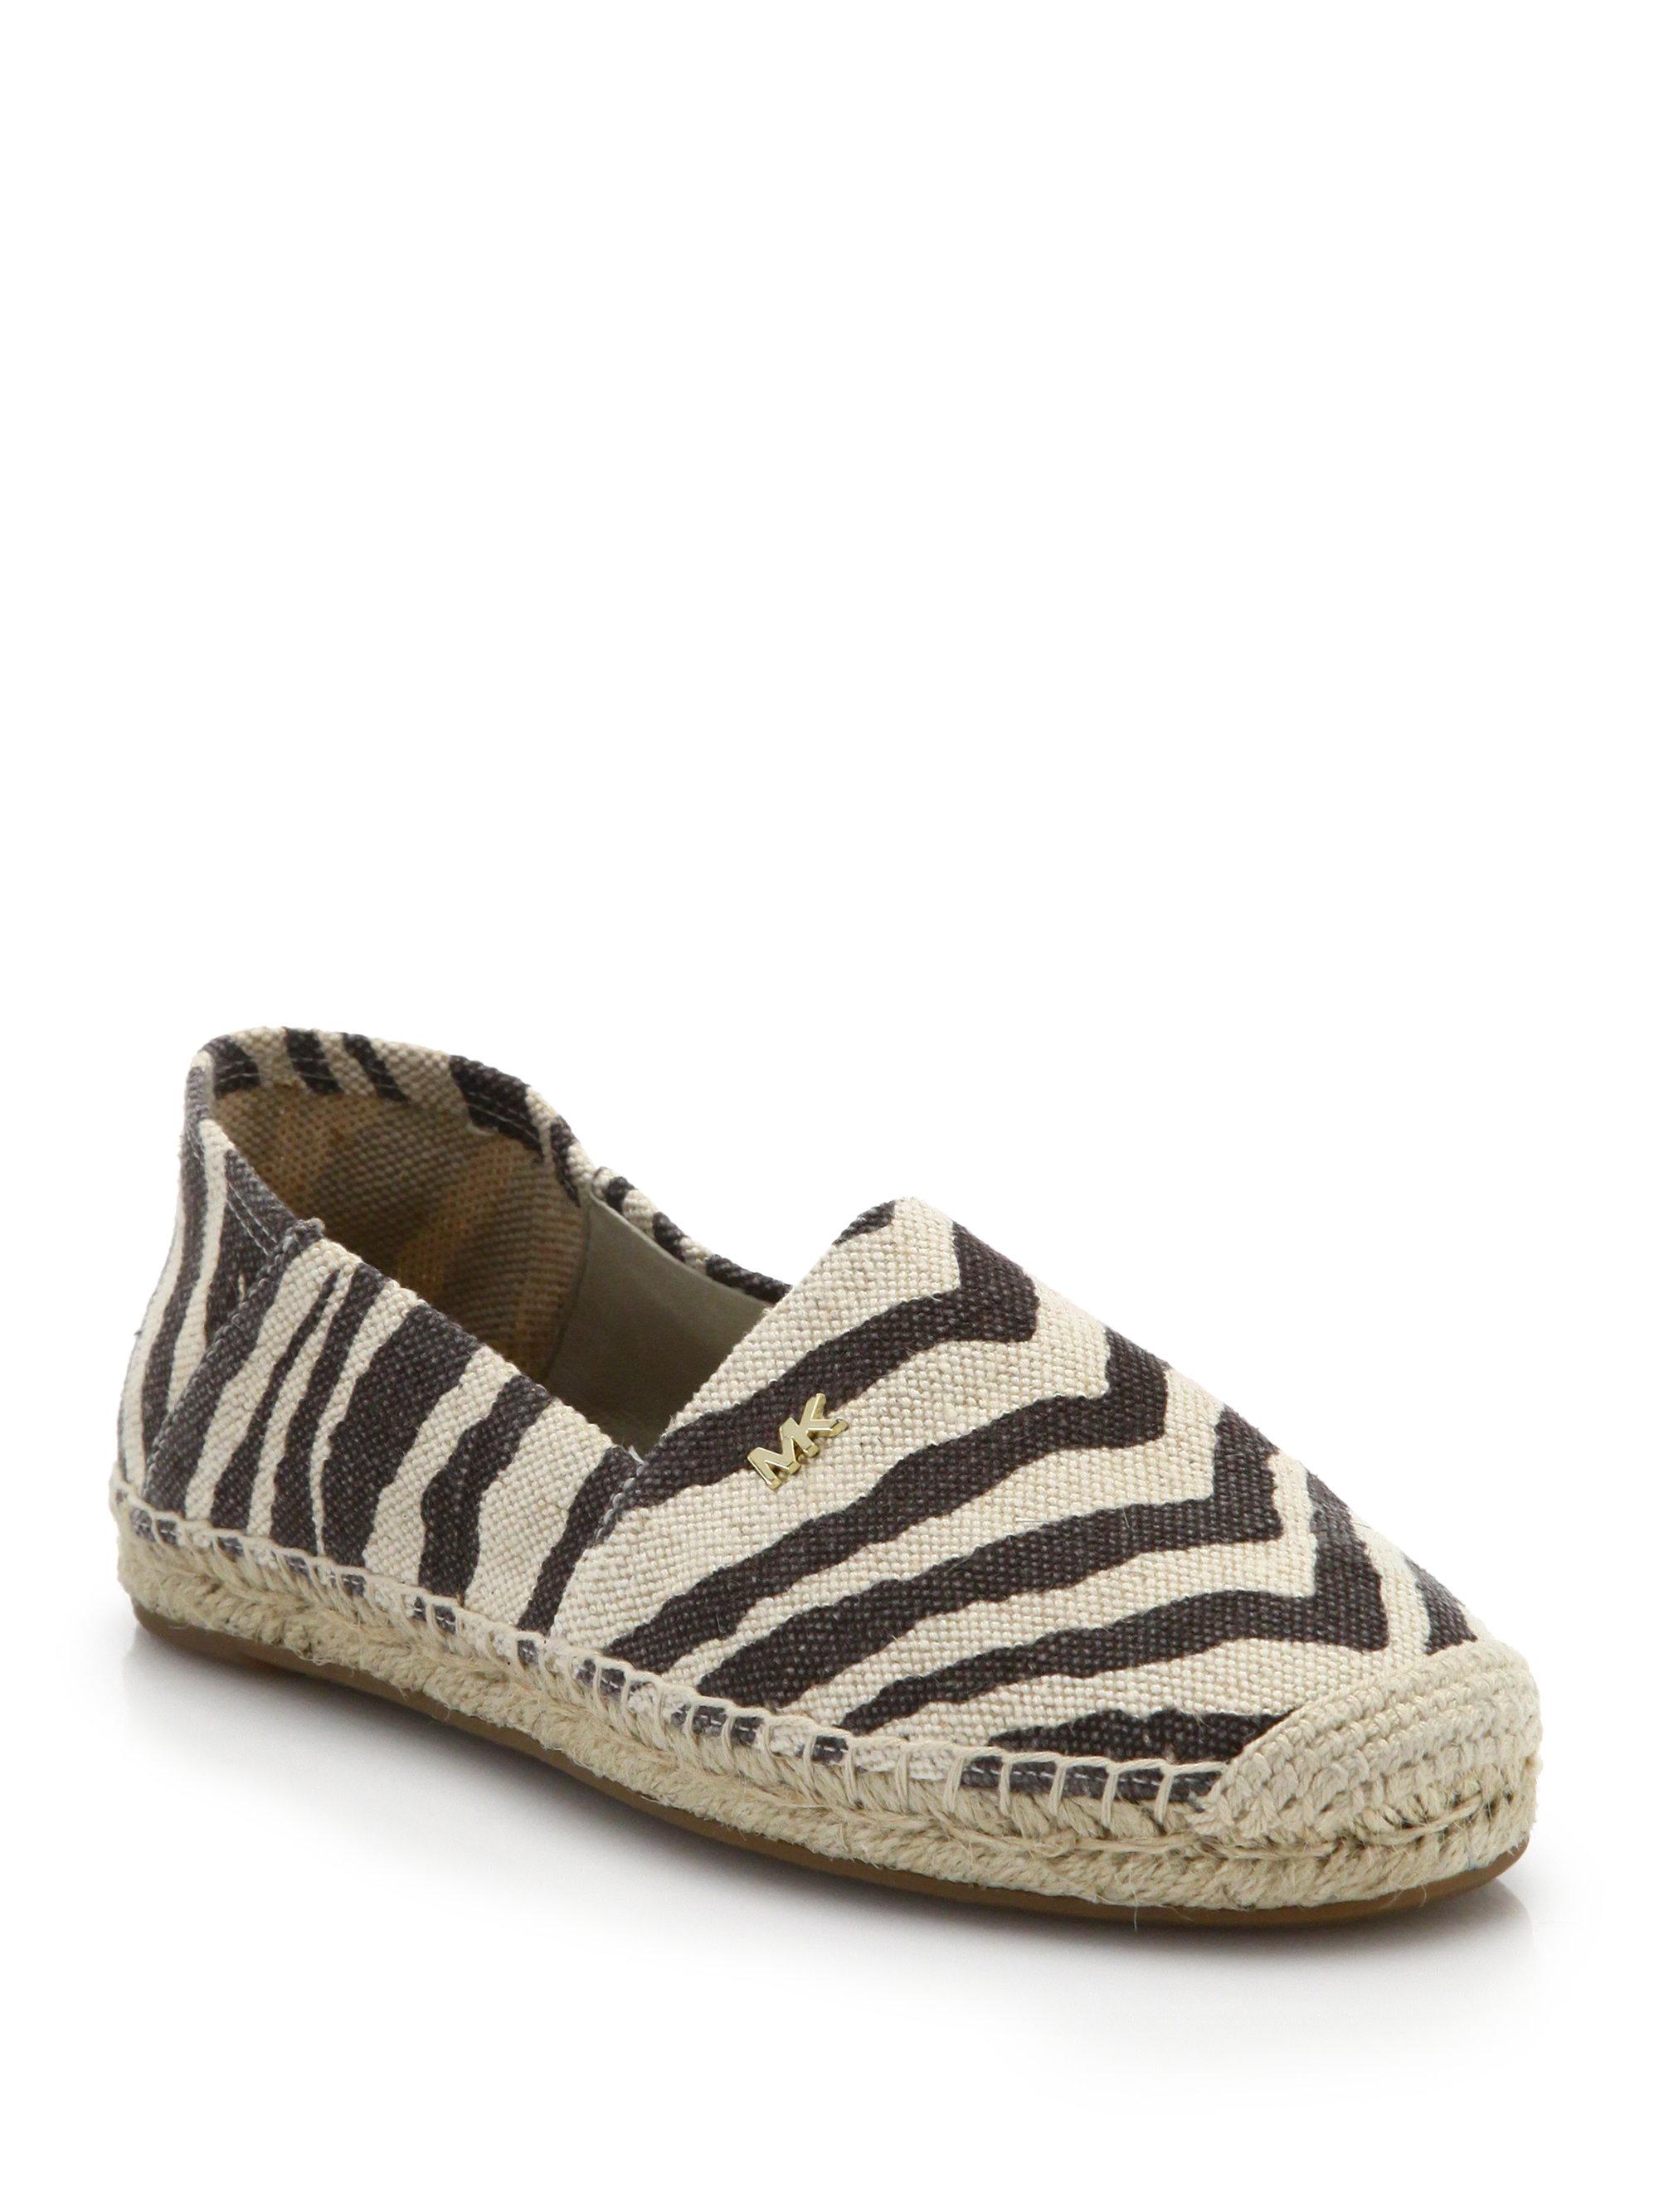 Michael Kors Canvas Flat Shoes